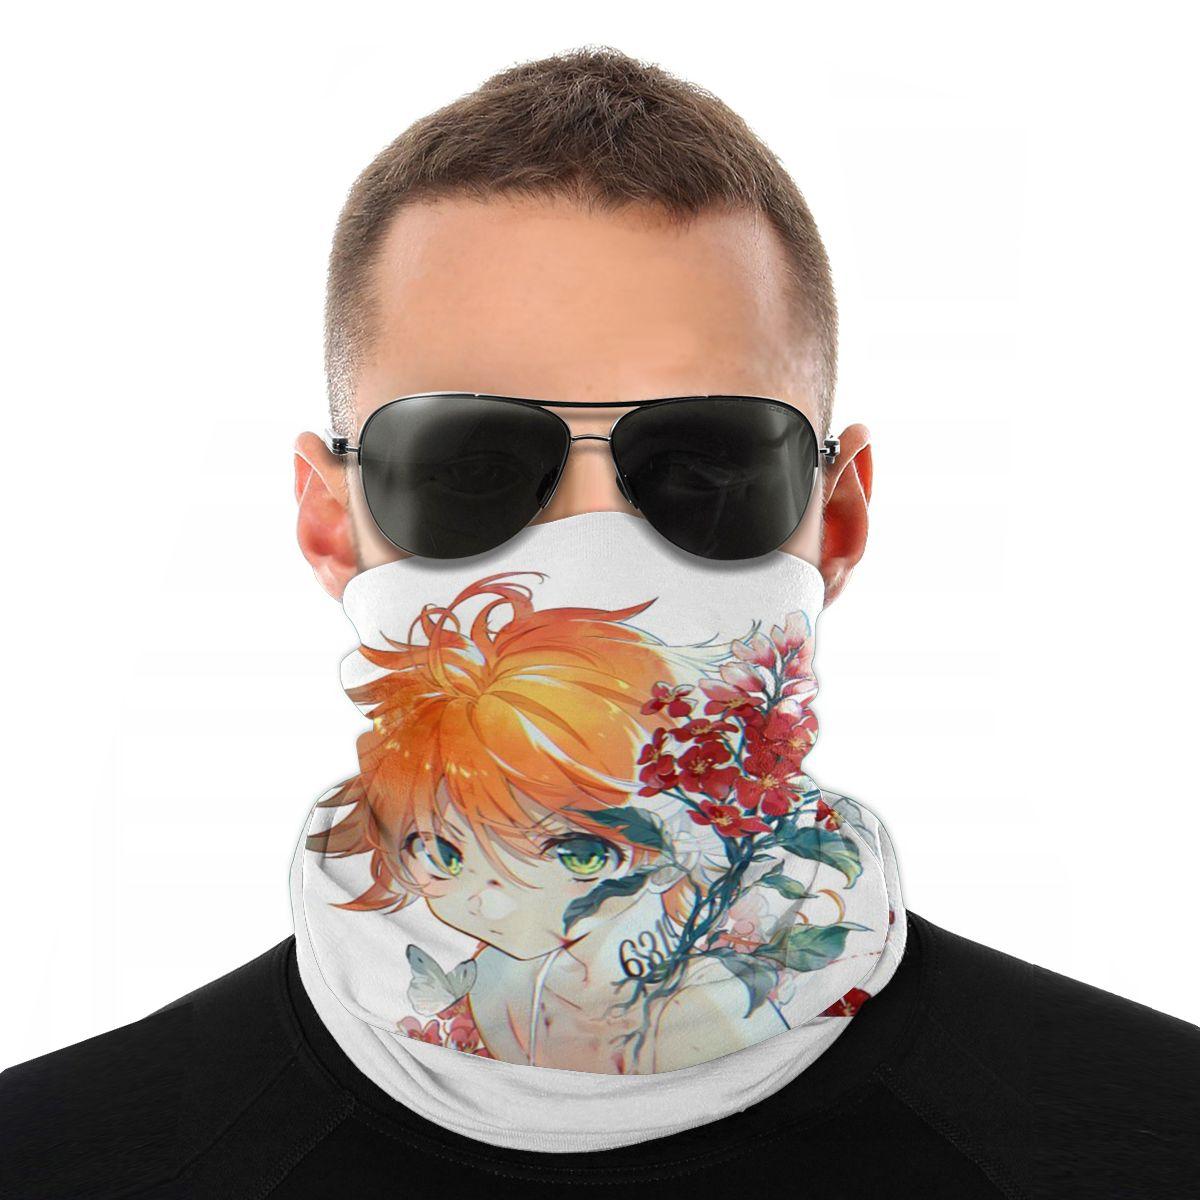 The Promised Neverland Anime Scarf Neck Face Mask Tube Mask Young Sukura Balaclava Bandanas Protective Headwear Outdoor Hiking